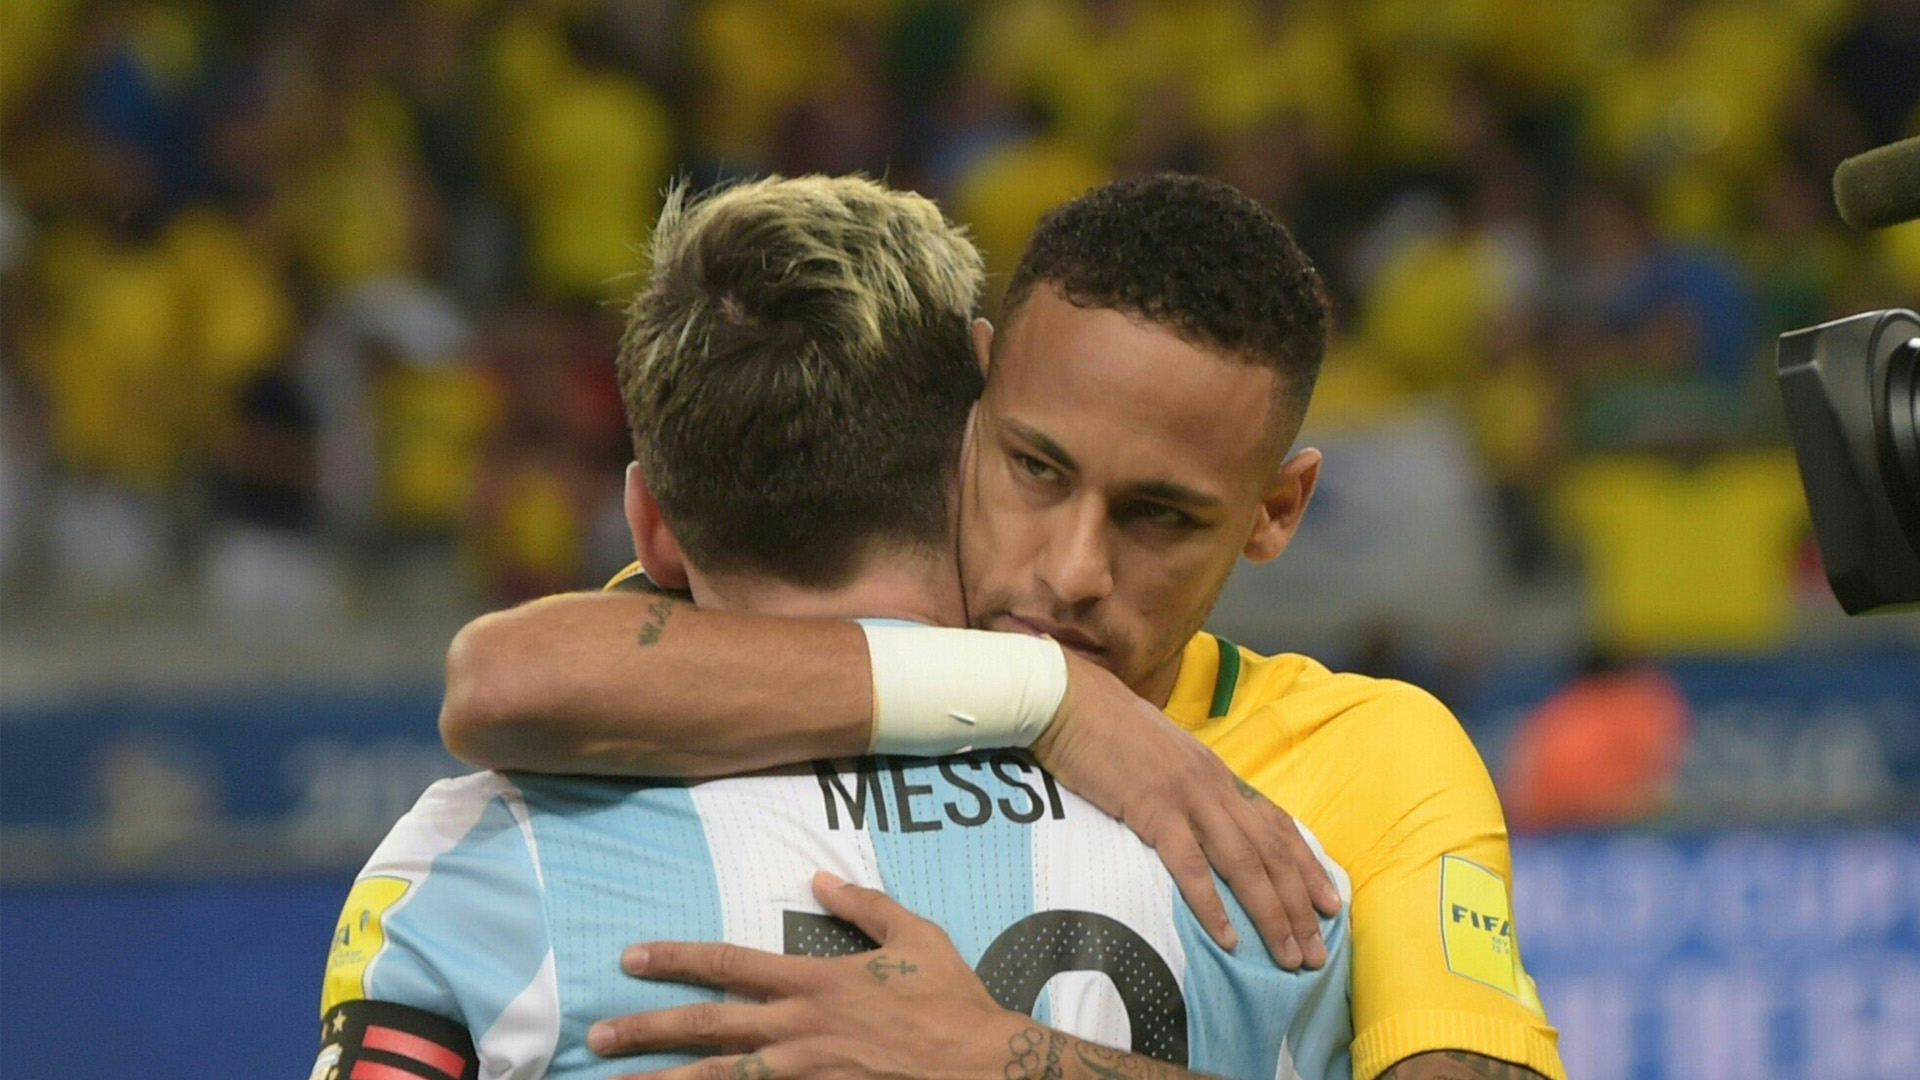 Opponent team fan spat in Lionel Messi 12/21/2015 80